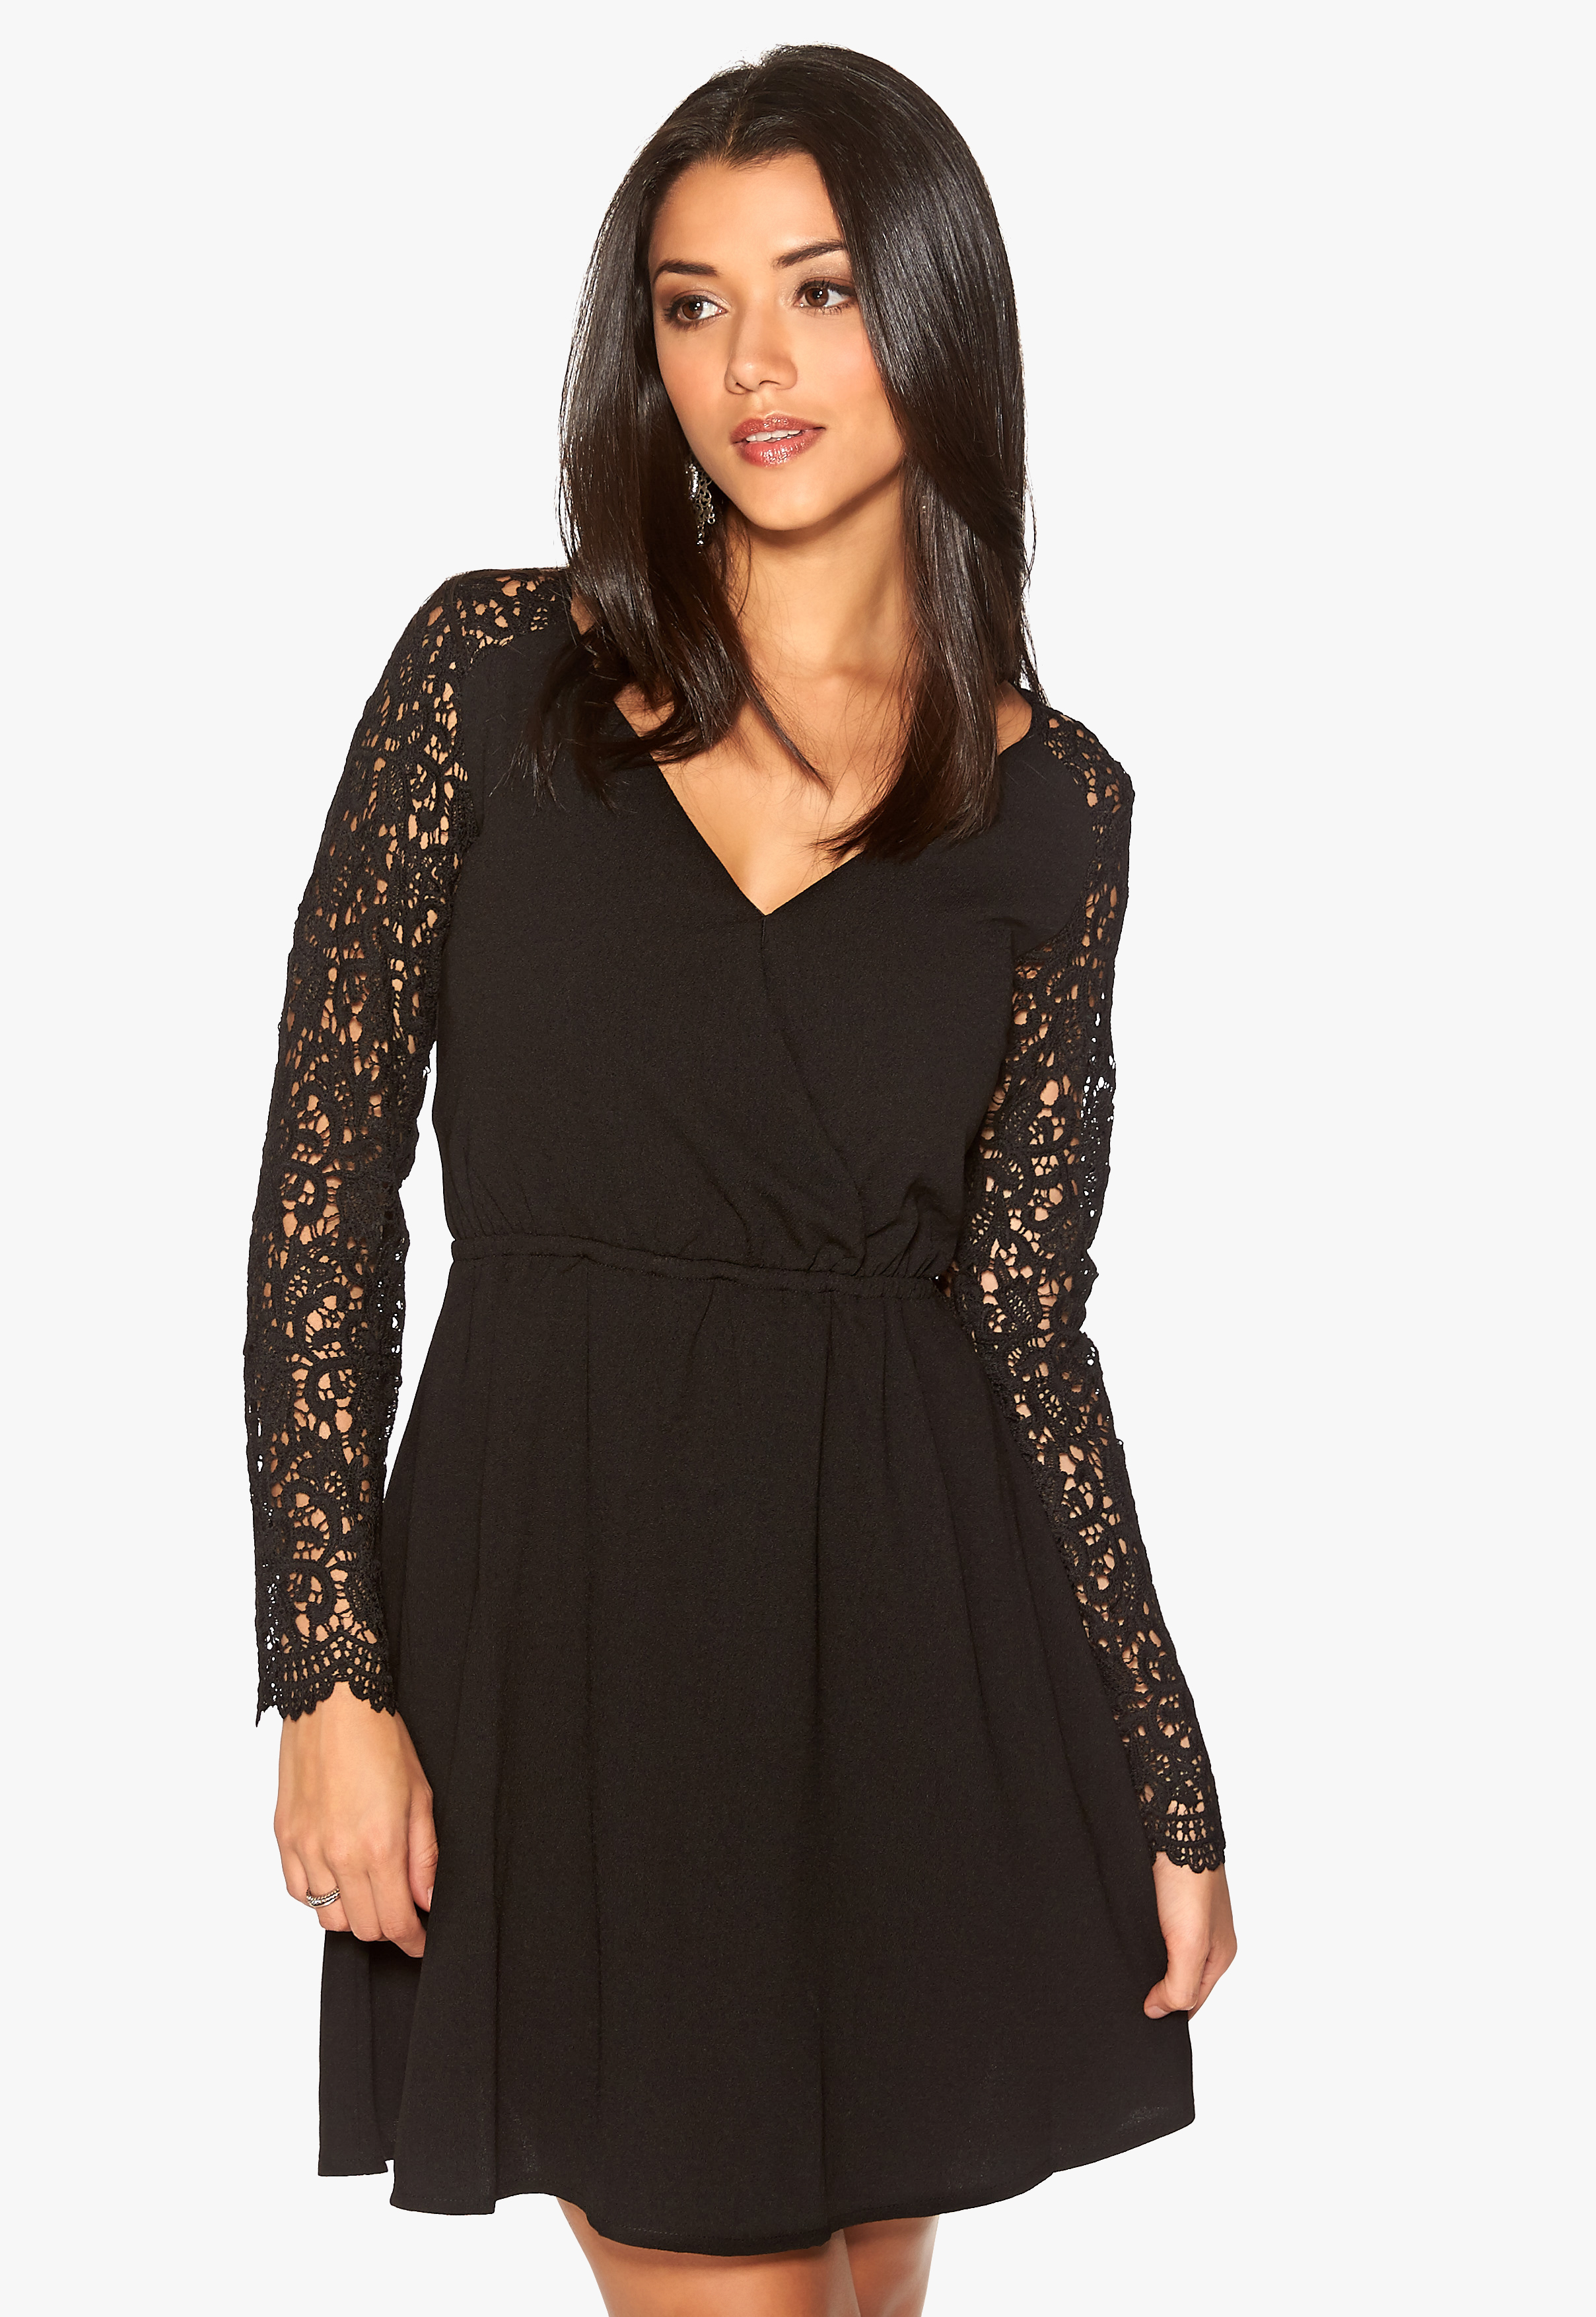 dry lake arille short lace dress black bubbleroom